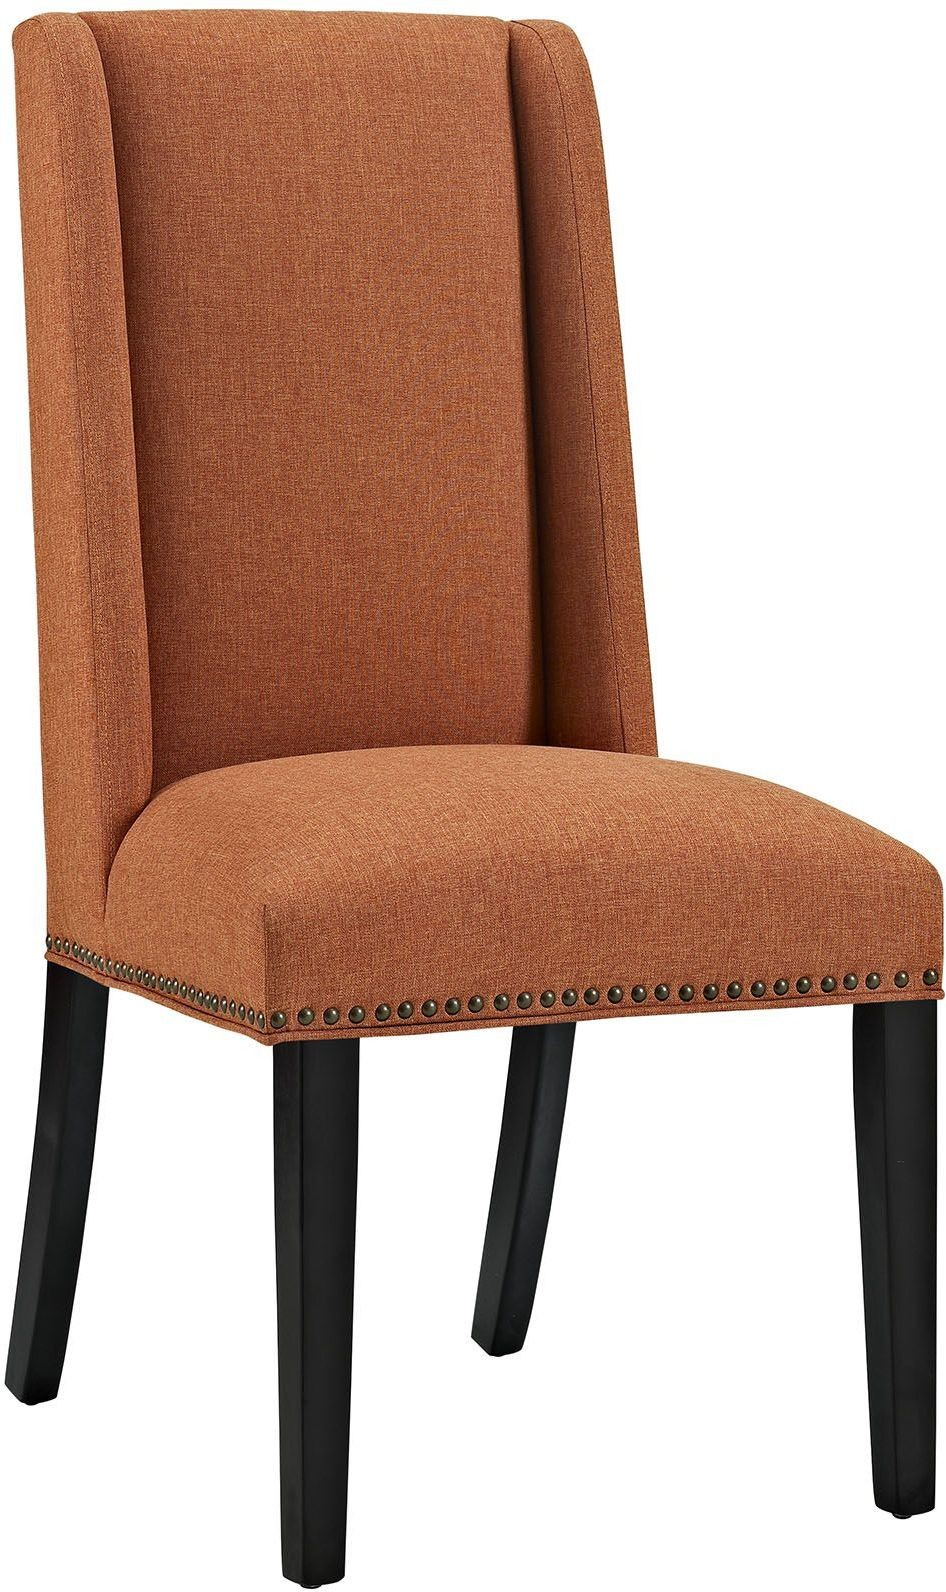 Baron Orange Upholstered Dining Chair EEI2233ORA